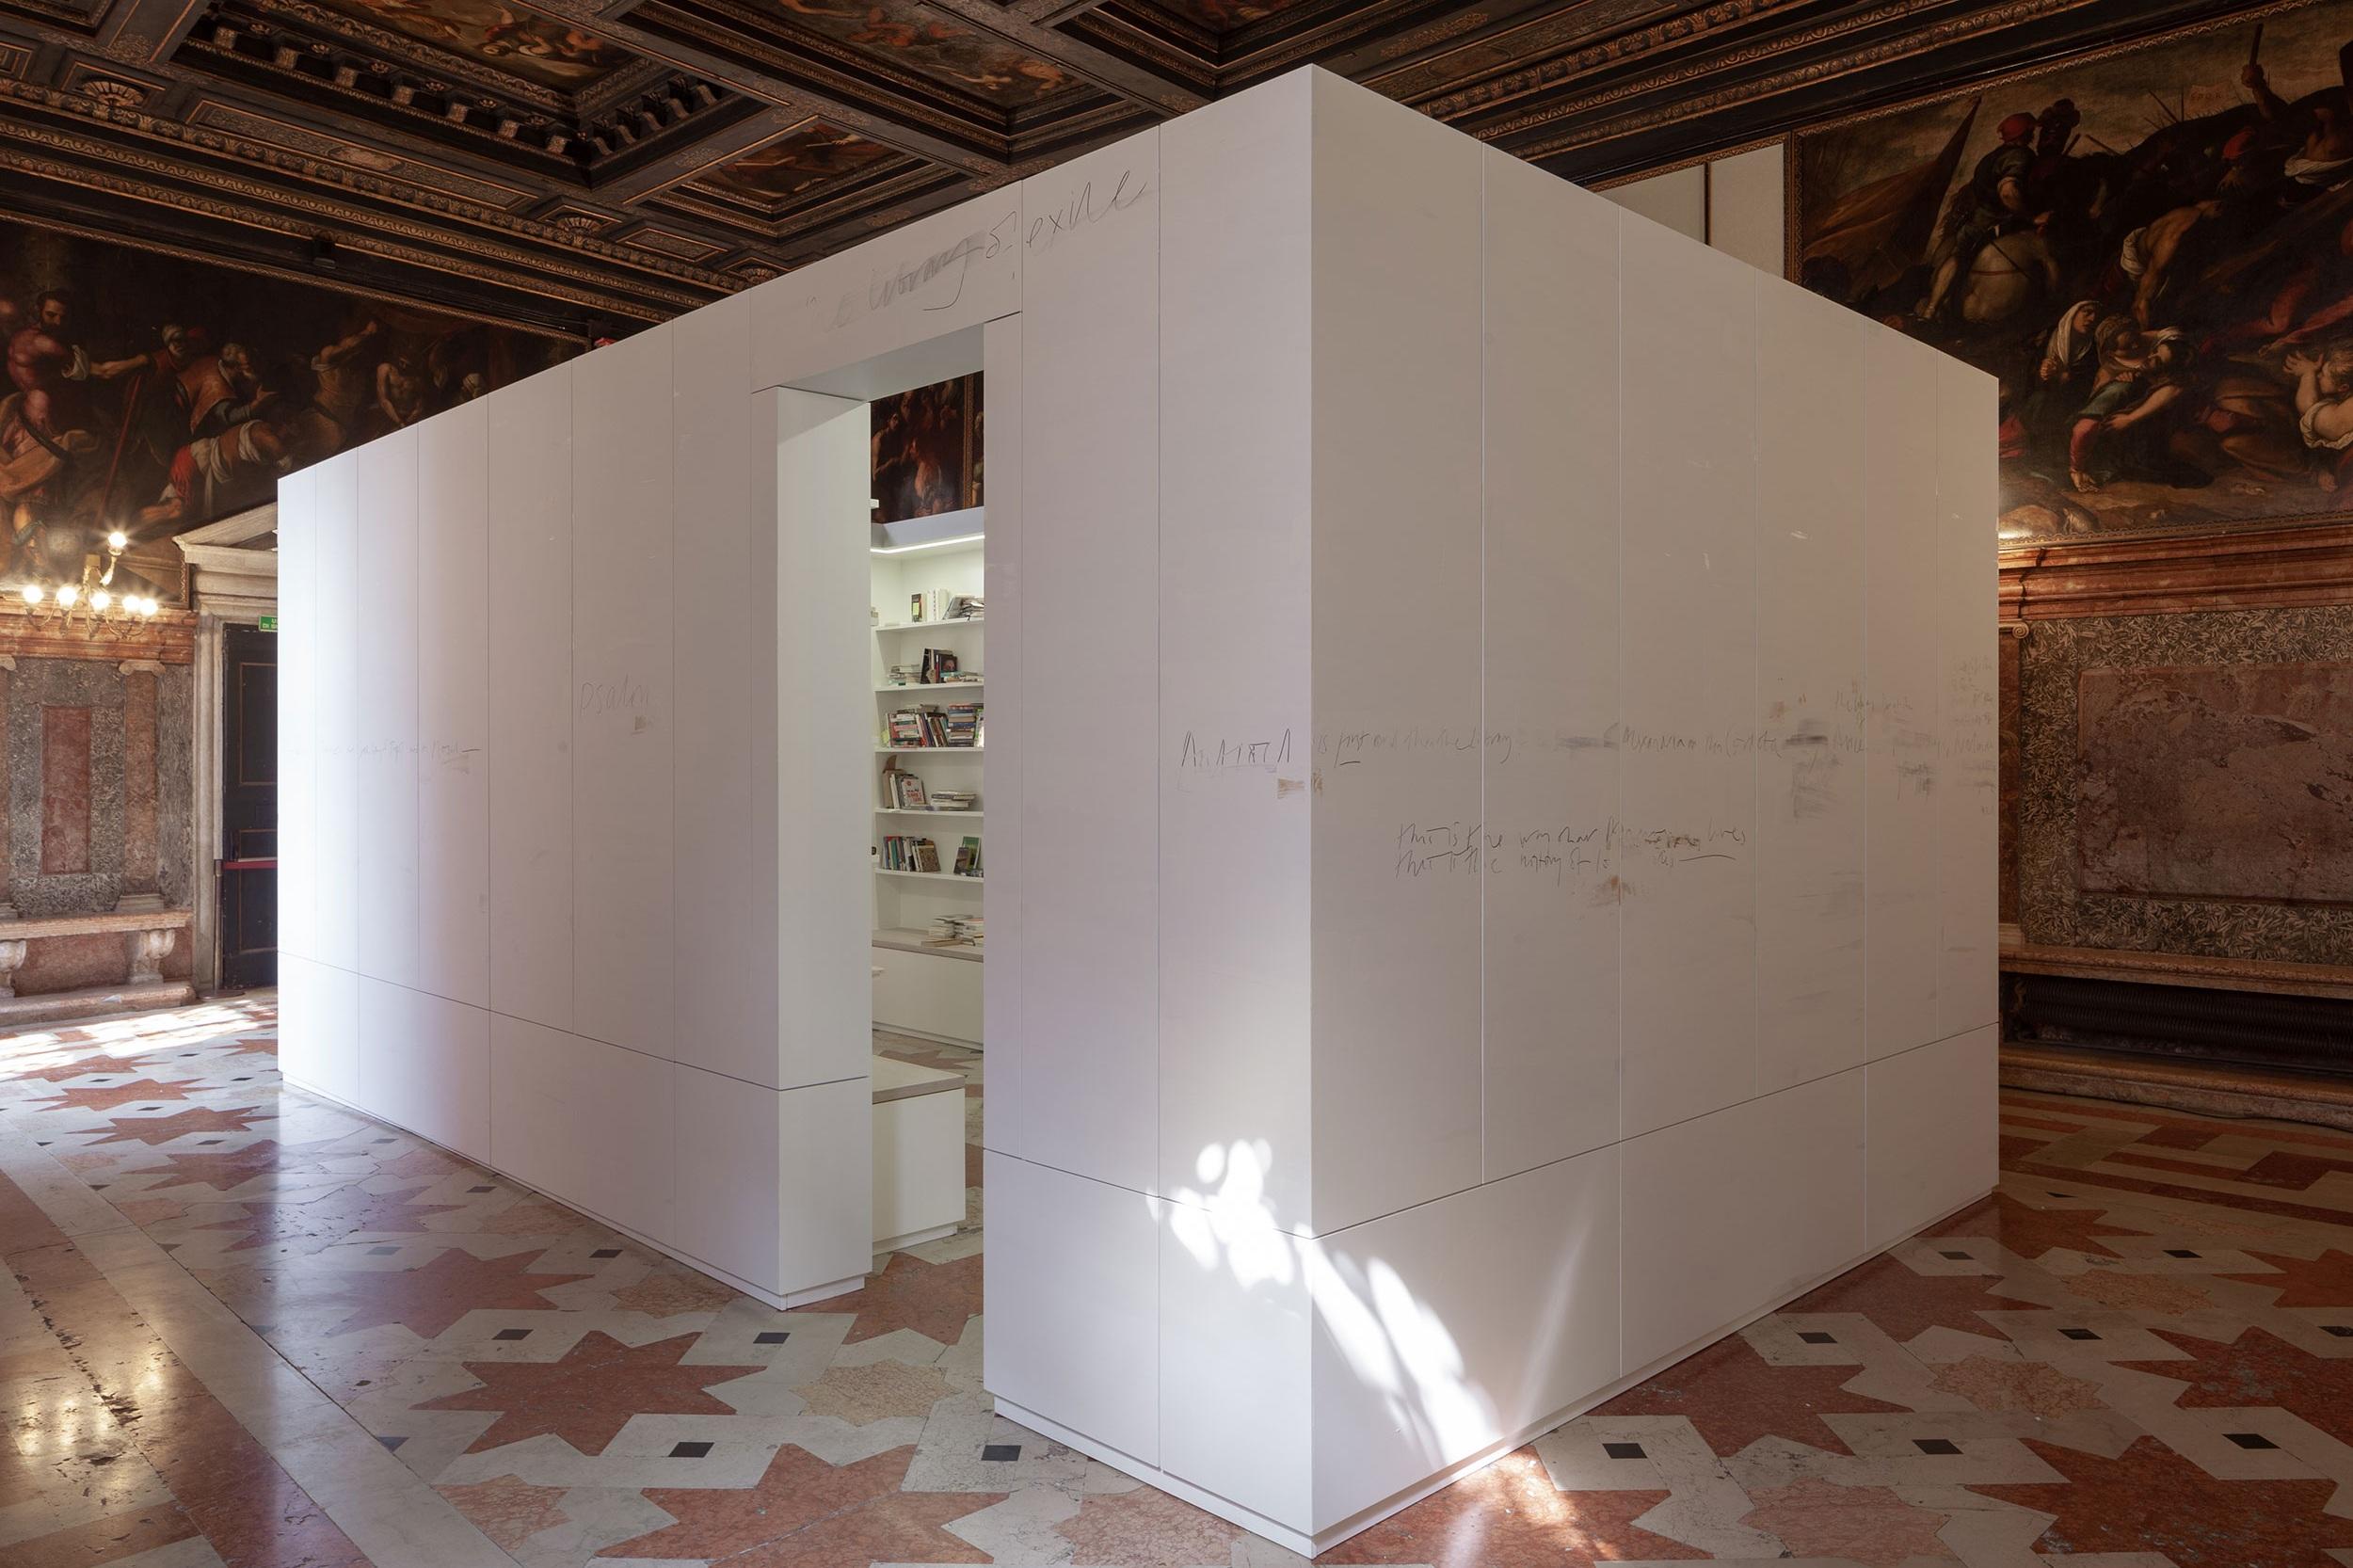 Edmund+de+Waal+Psalm+Venice+Installation+View_10.jpg